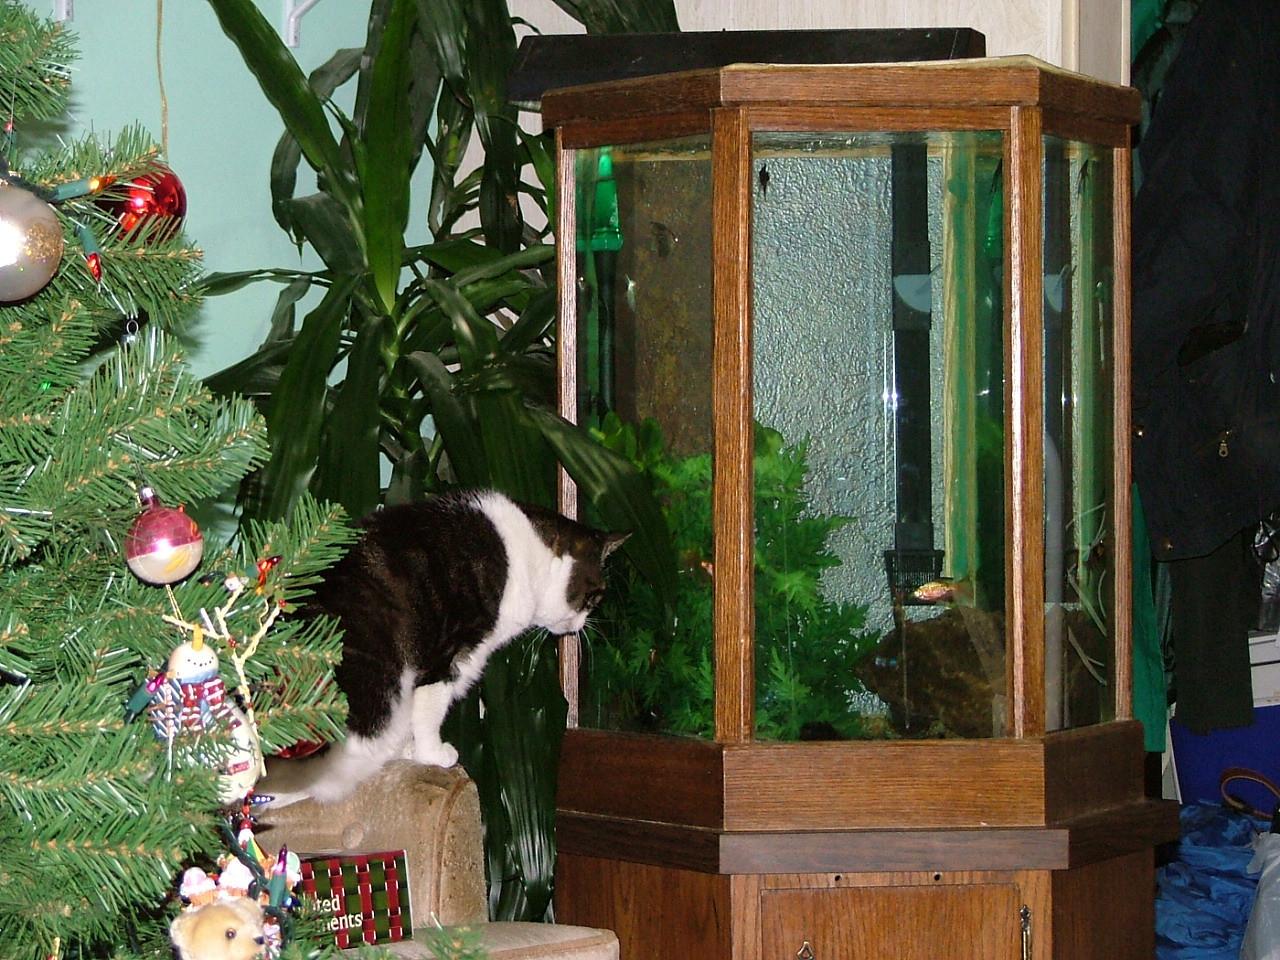 Esmer staring at the fish